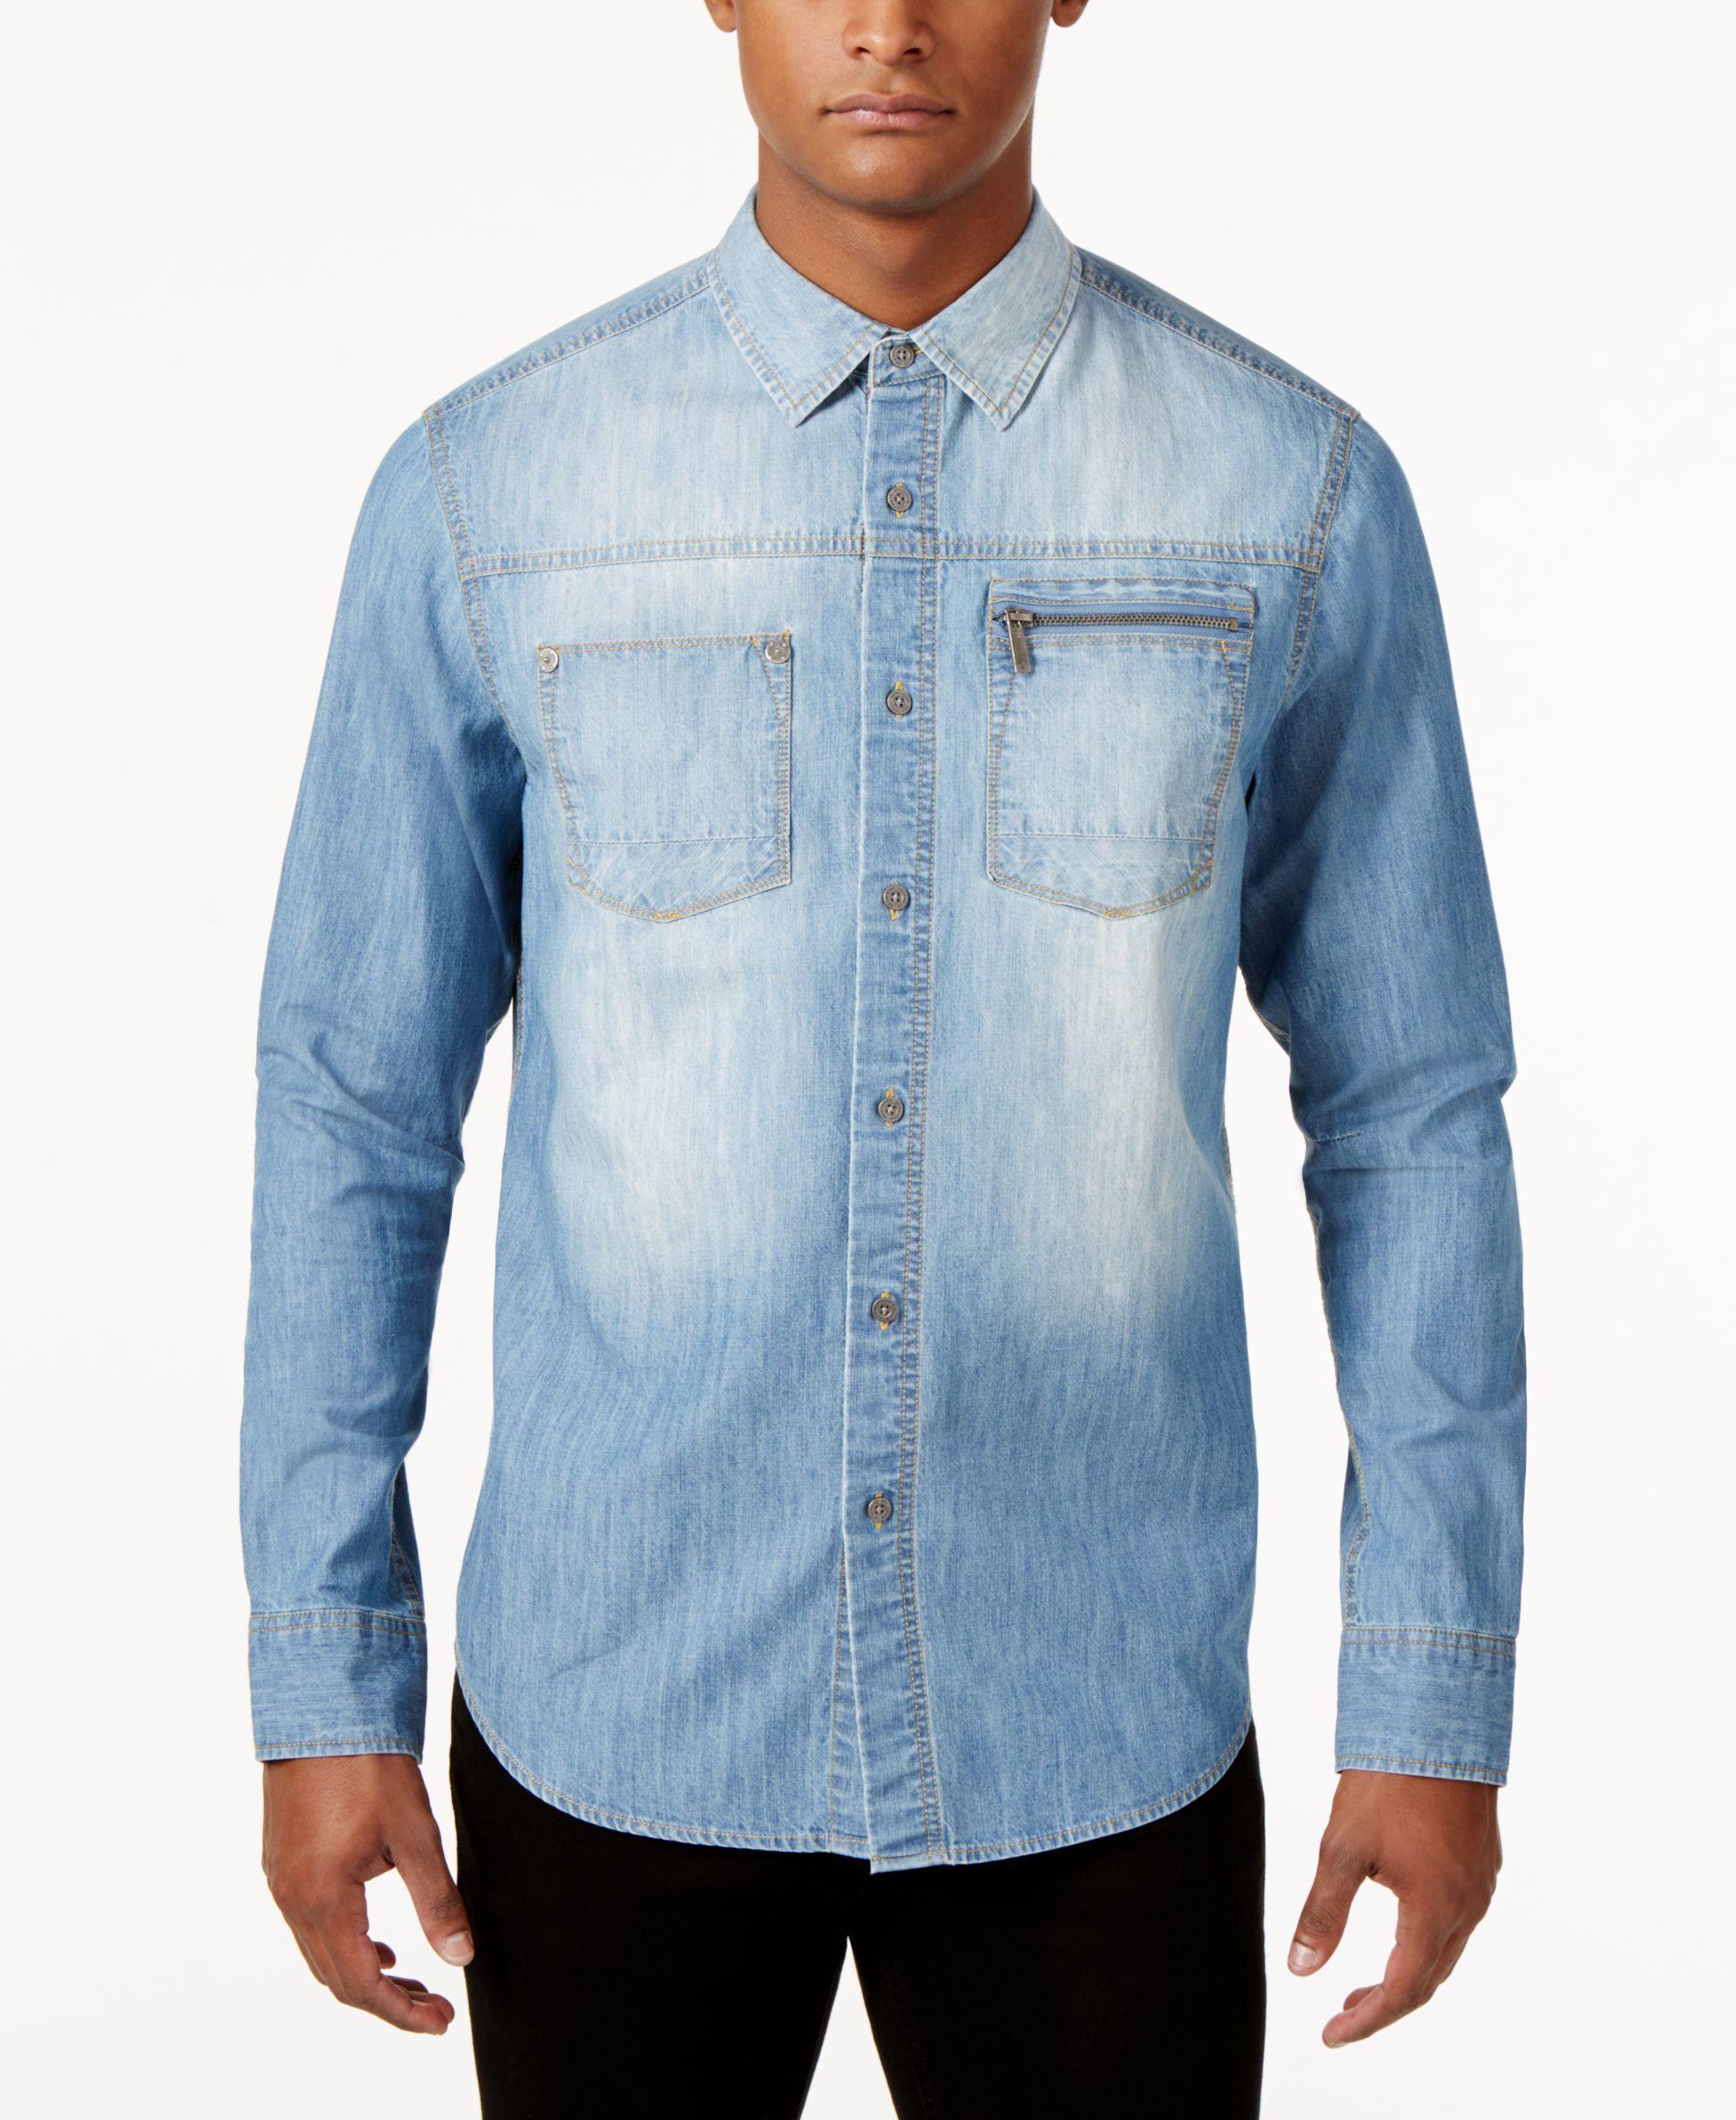 1c8fdb624b3 Sean John Men s Denim Shirt